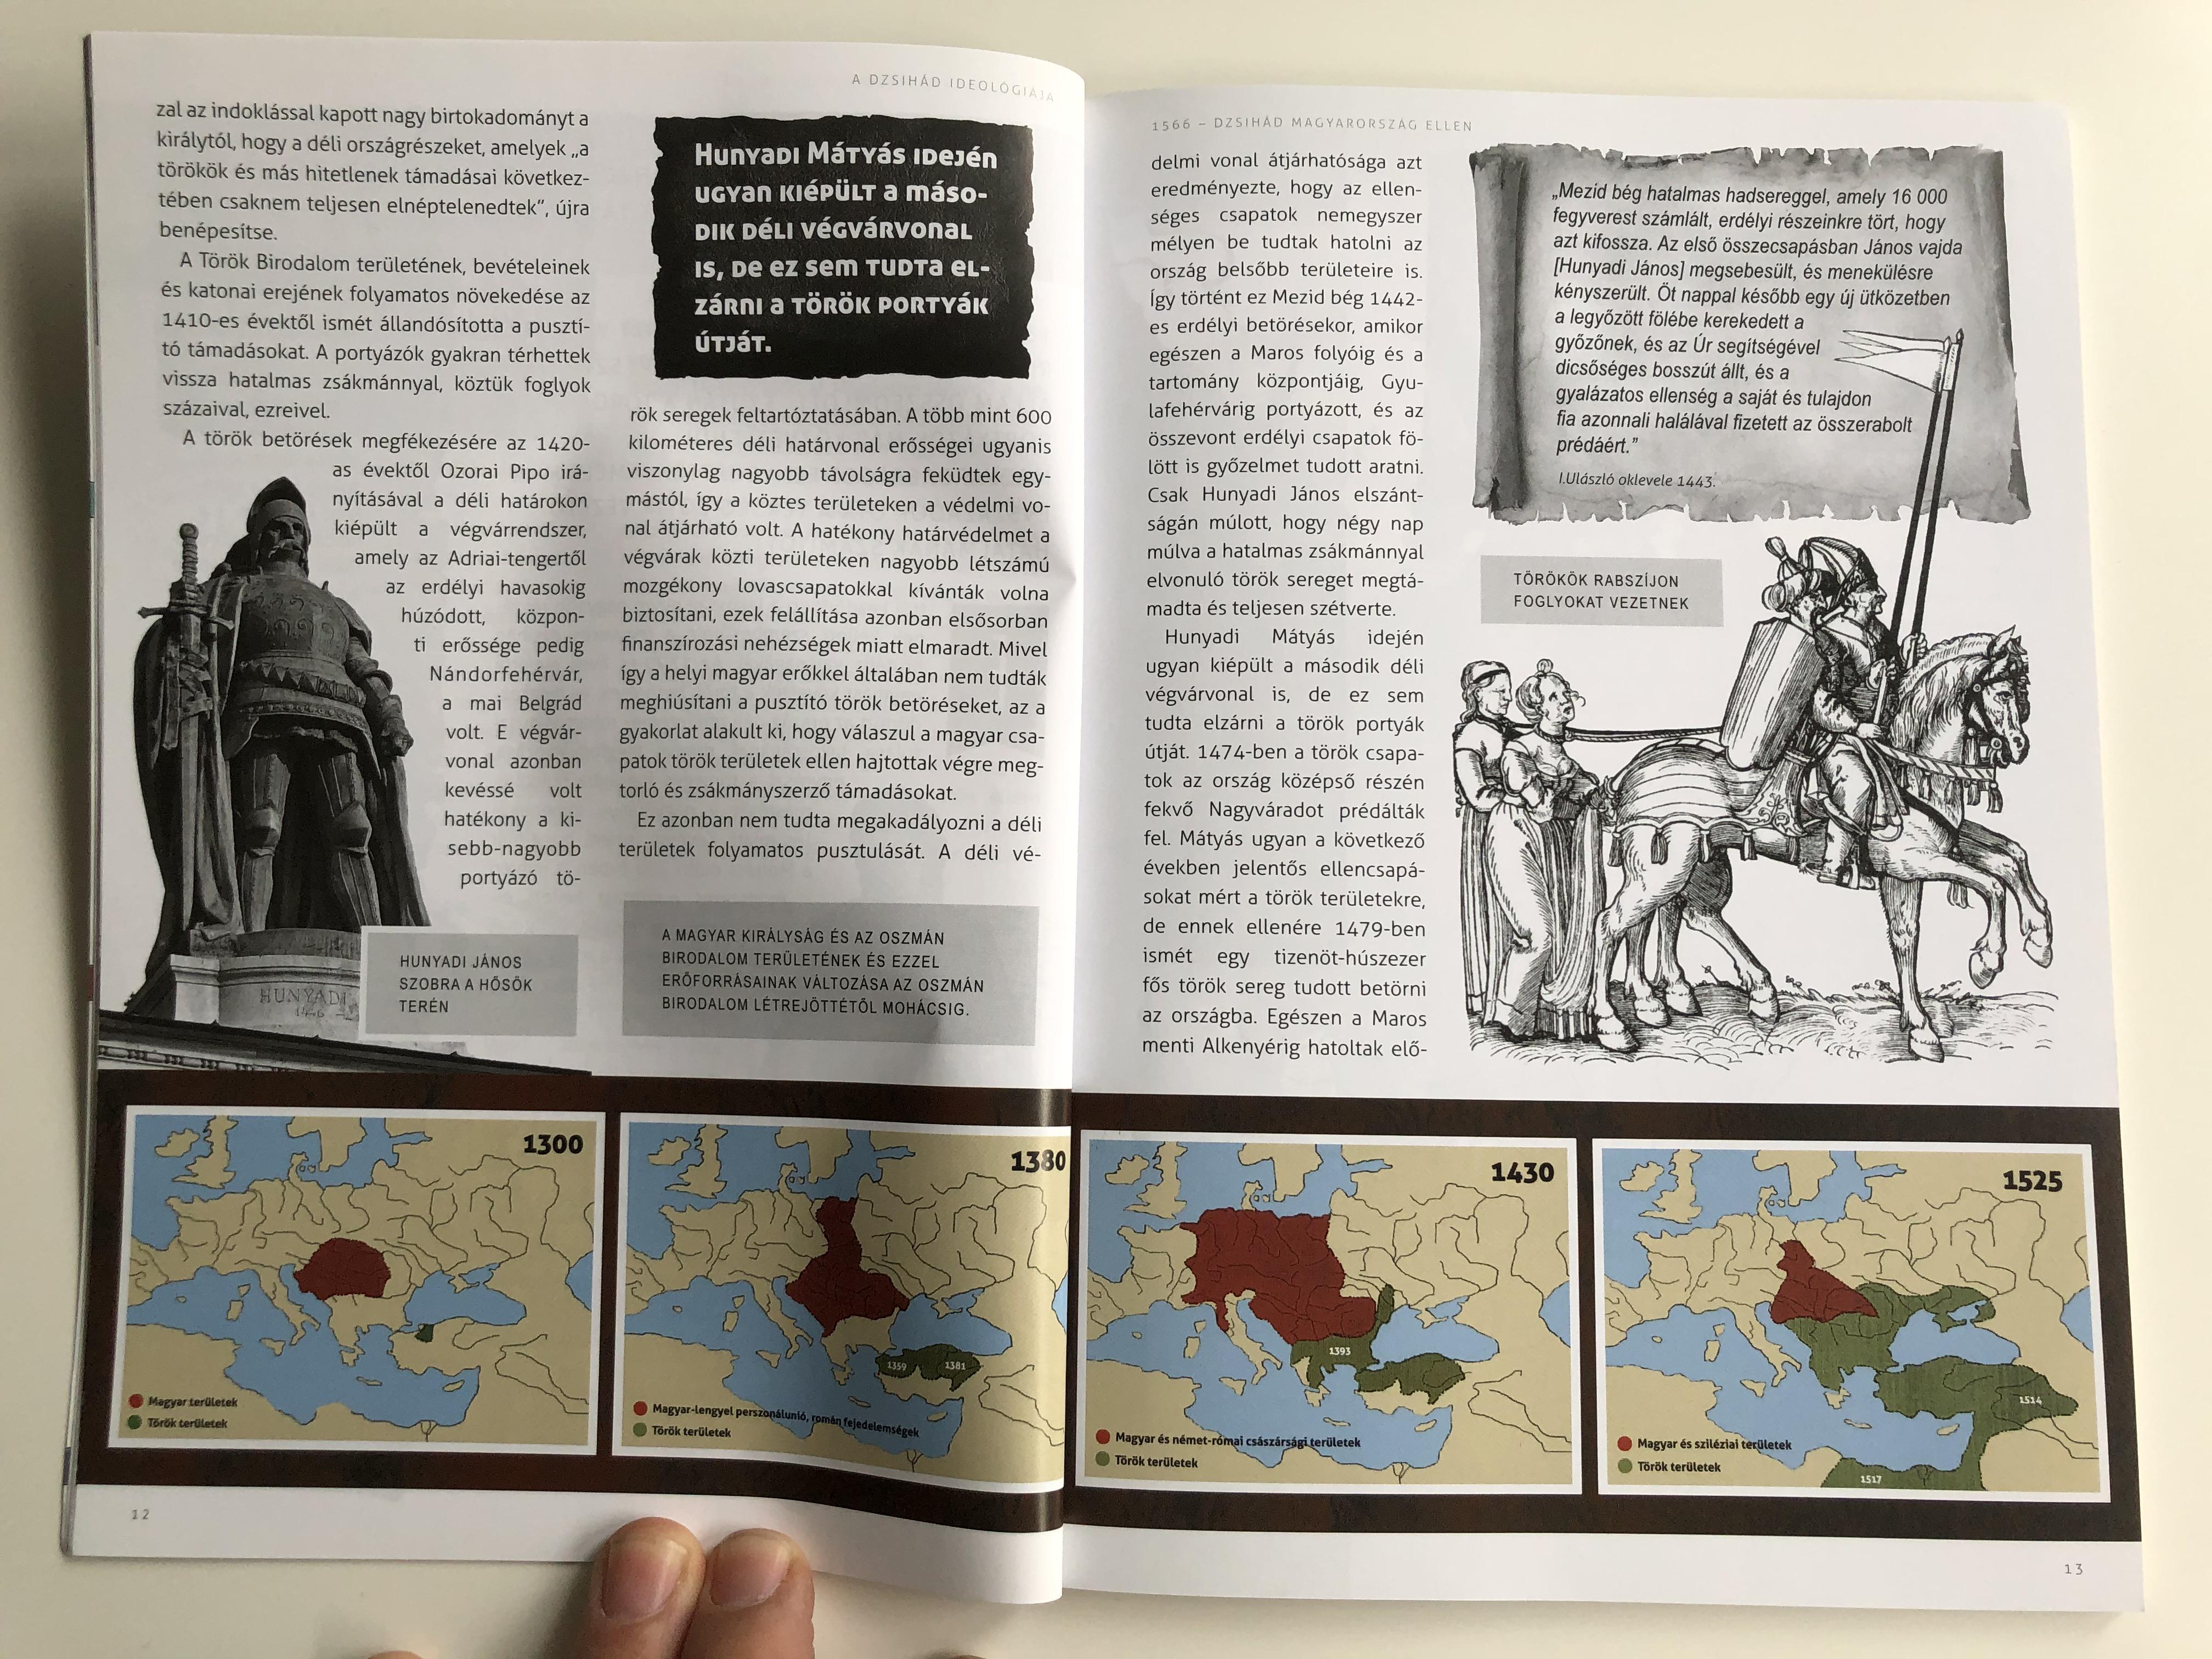 1566-dzsih-d-magyarorsz-g-ellen-zr-nyi-kora-s-a-t-r-k-h-dolts-g-7.jpg